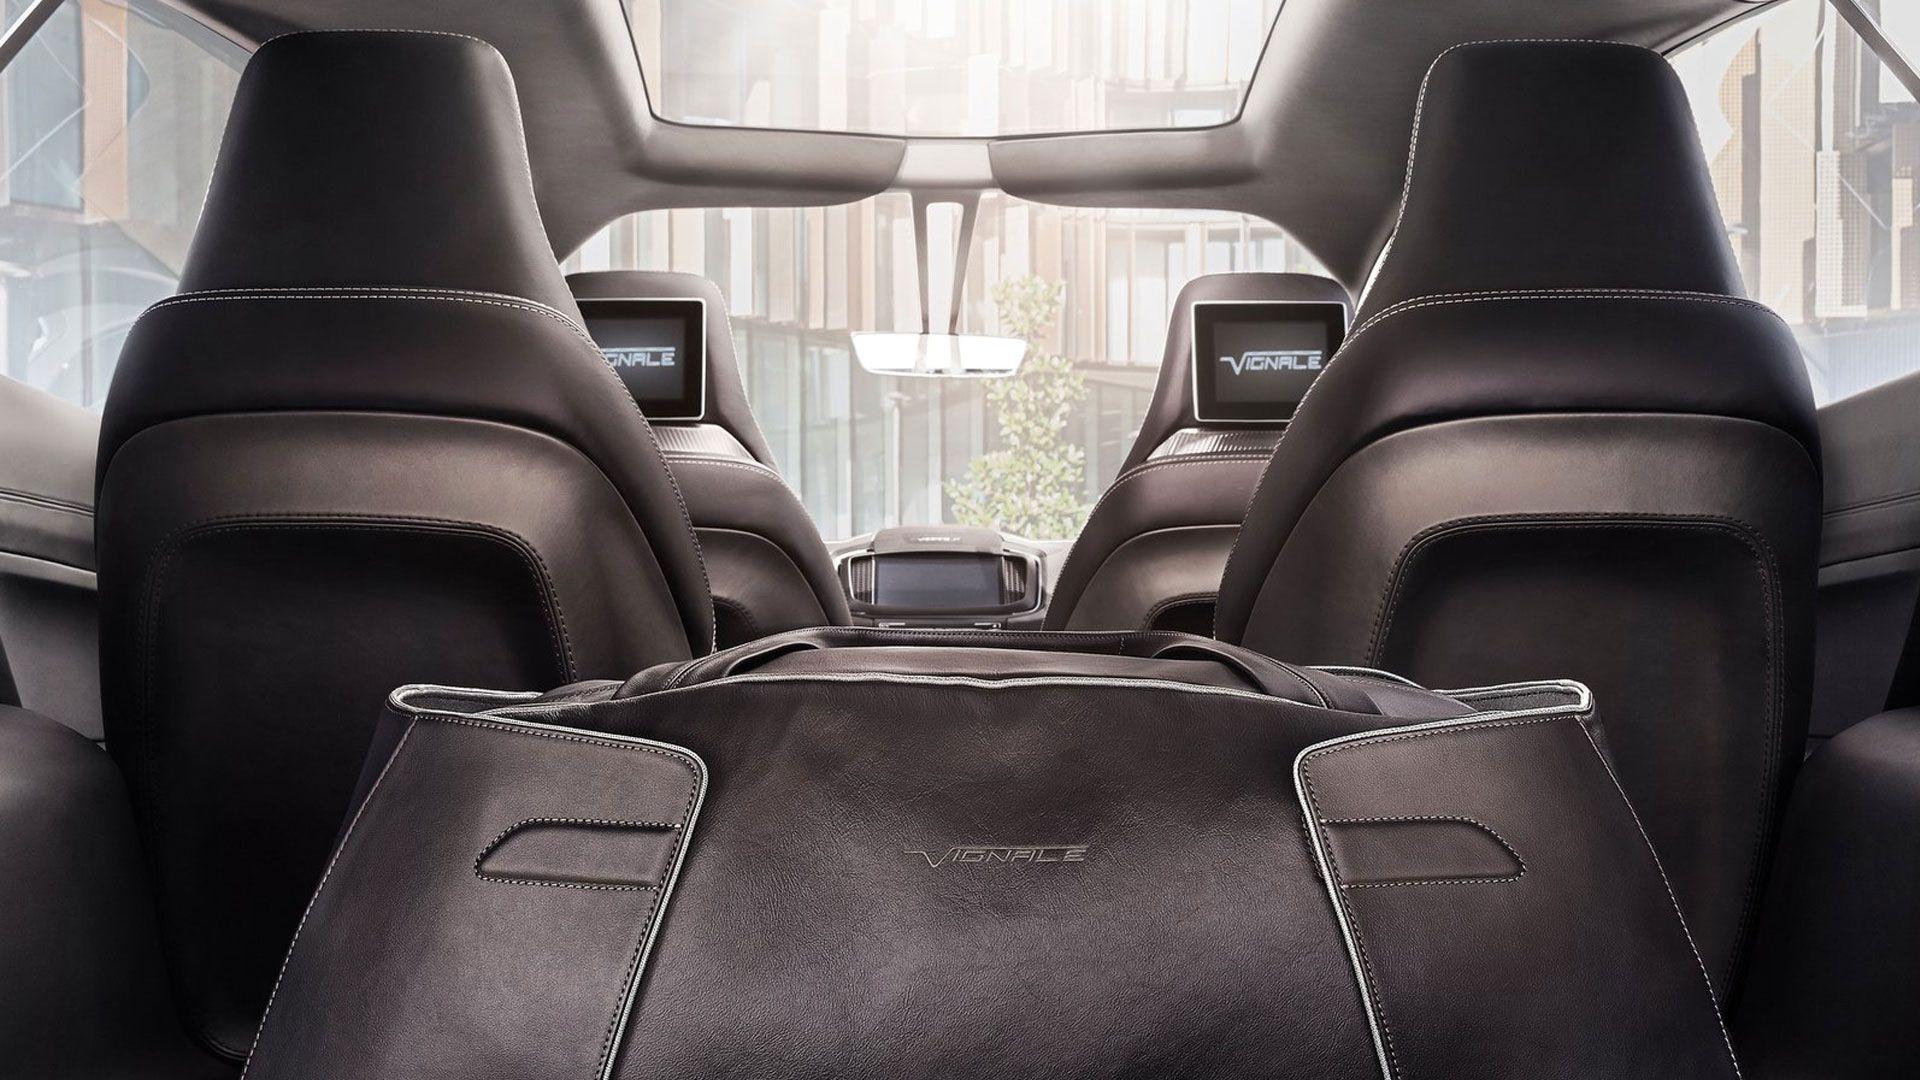 2014 Ford S Max Vignale Concept Cargo 2014 Ford S Max Vignale Concept Premium Design Ford Ford Vignale Luxury Automotive